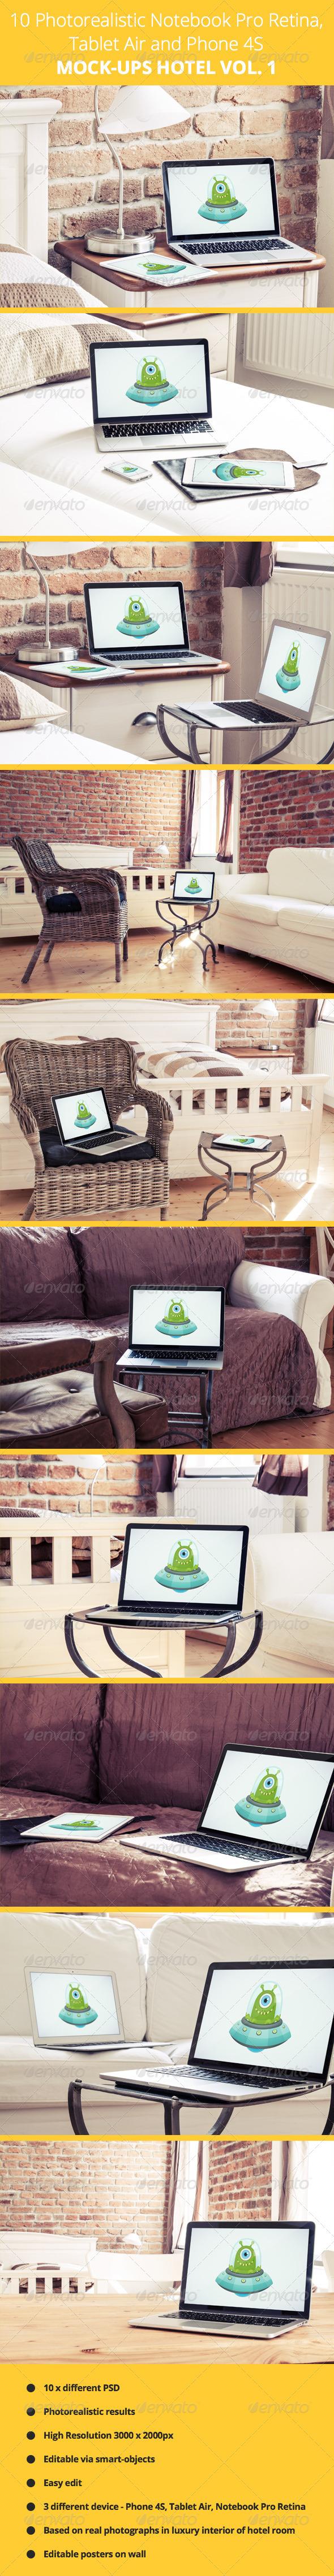 GraphicRiver 10 Photorealistic Device Mock-Ups in Hotel Vol.1 7091028